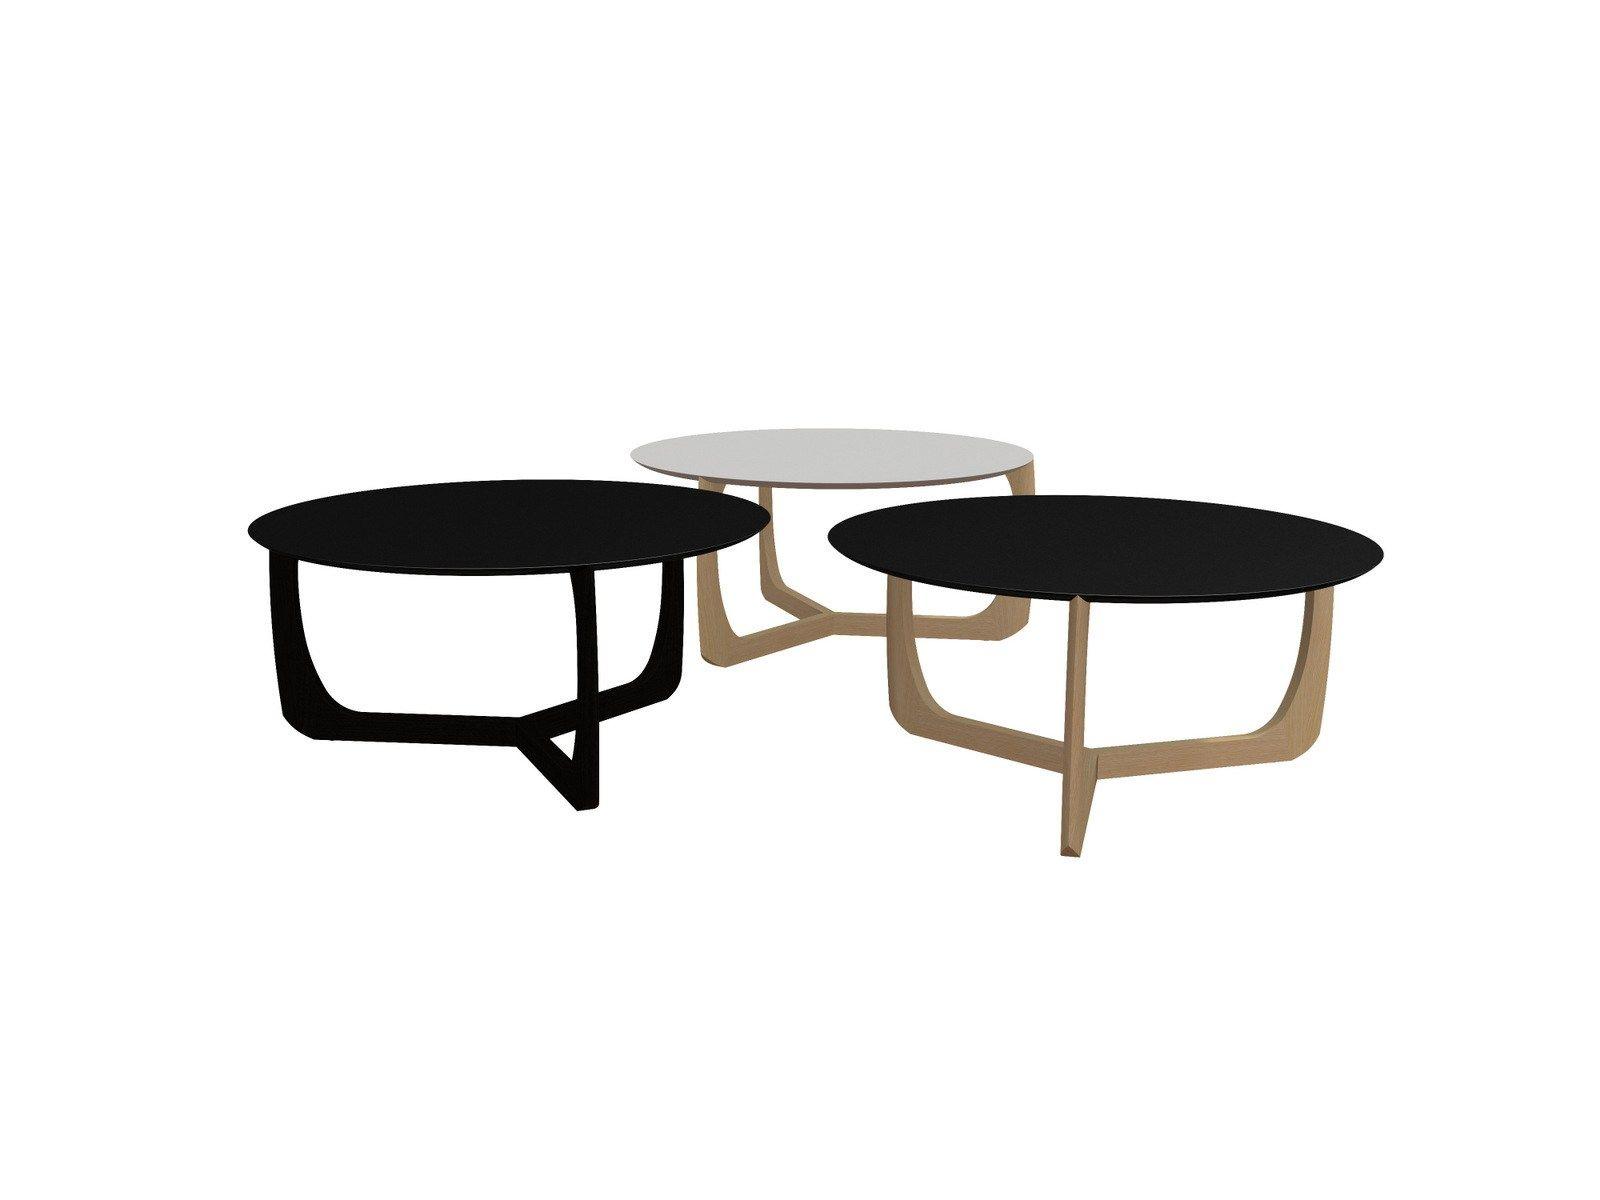 1efcafe5bebbde707444178ff9cd6704 Luxe De Table Tres Basse Conception